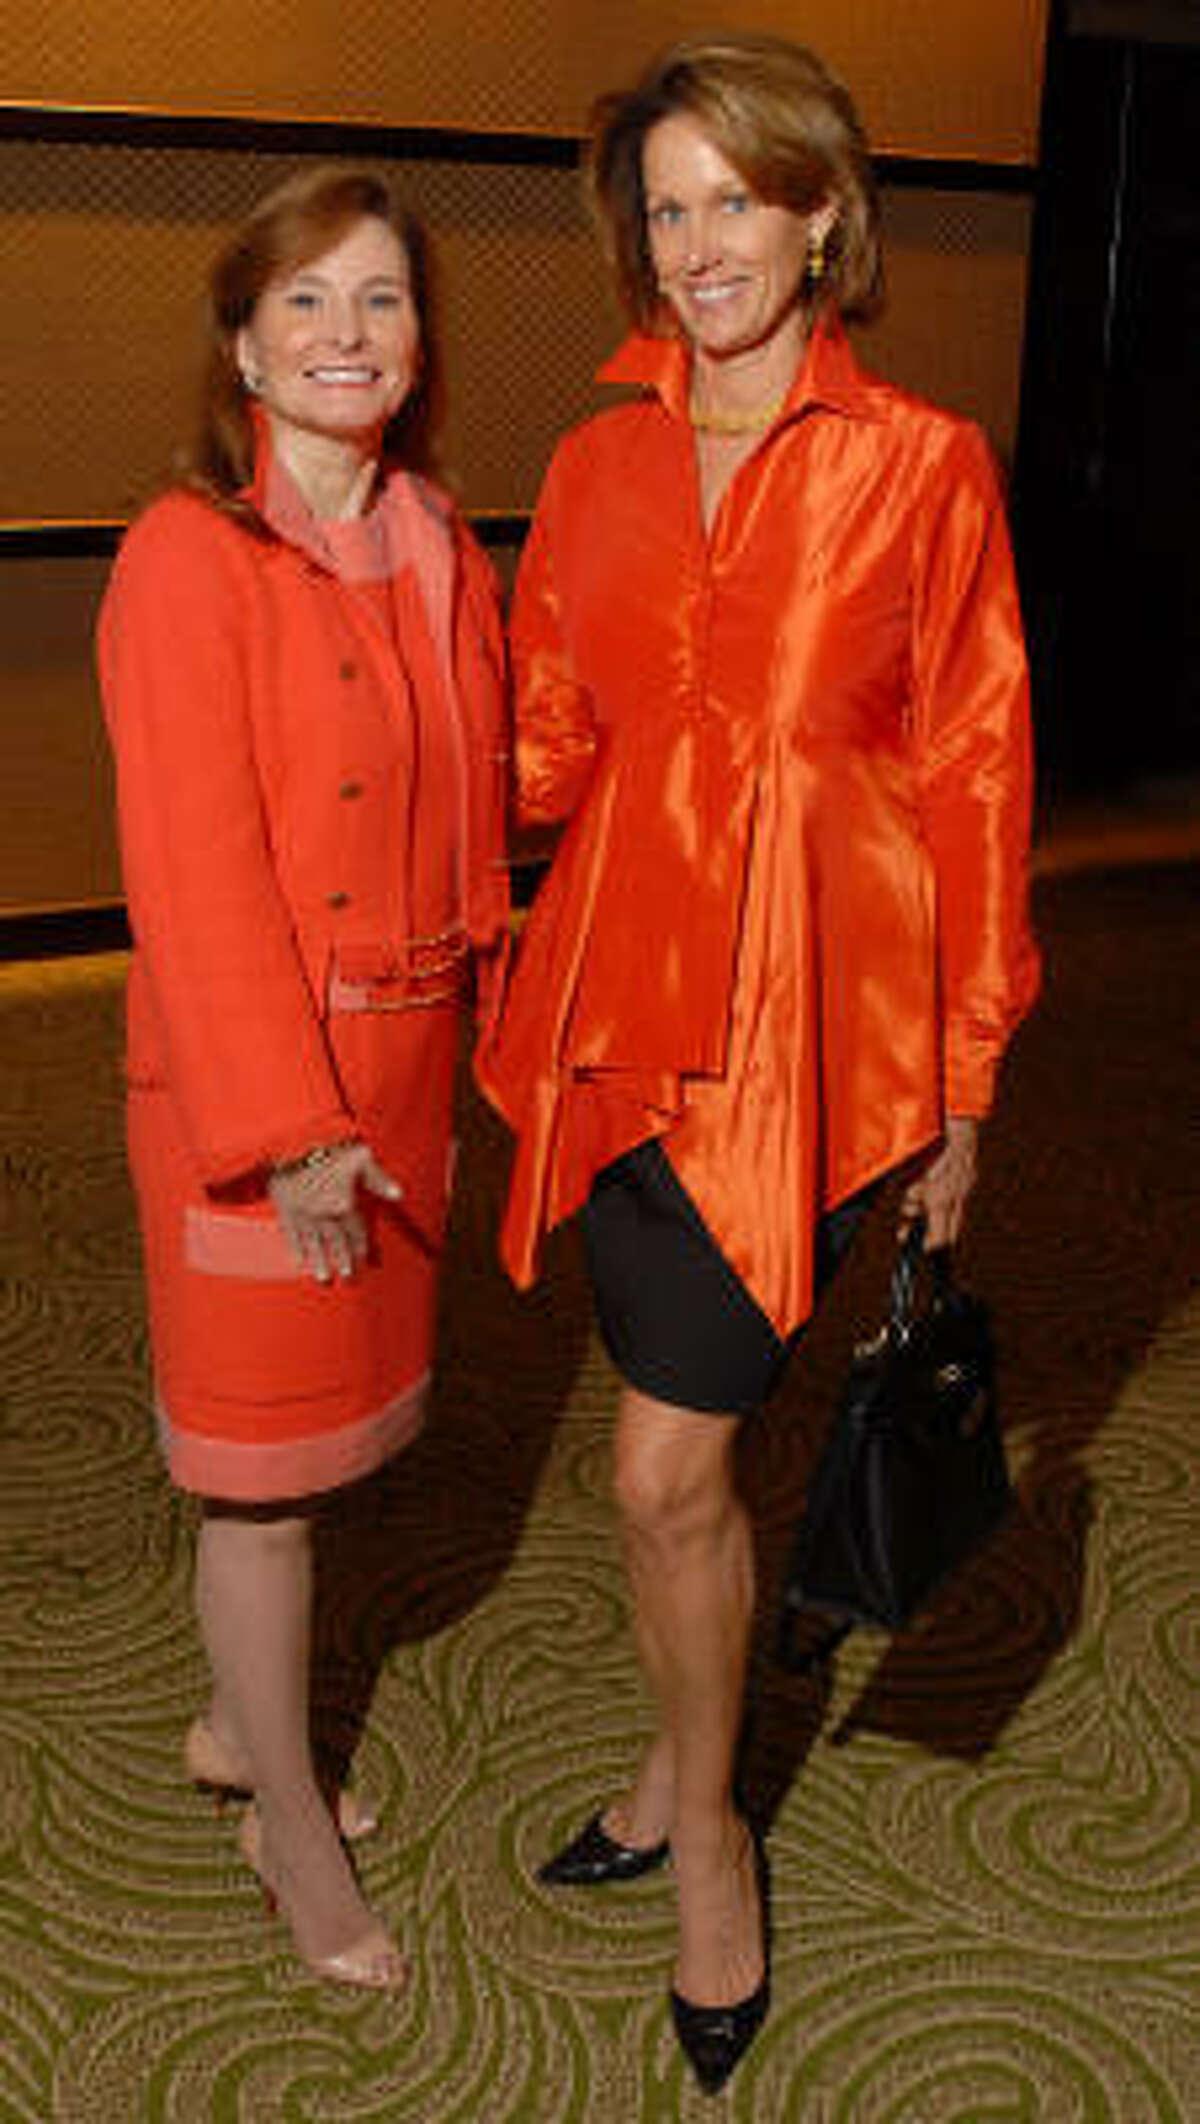 Ann Short and Barbara Aksamit